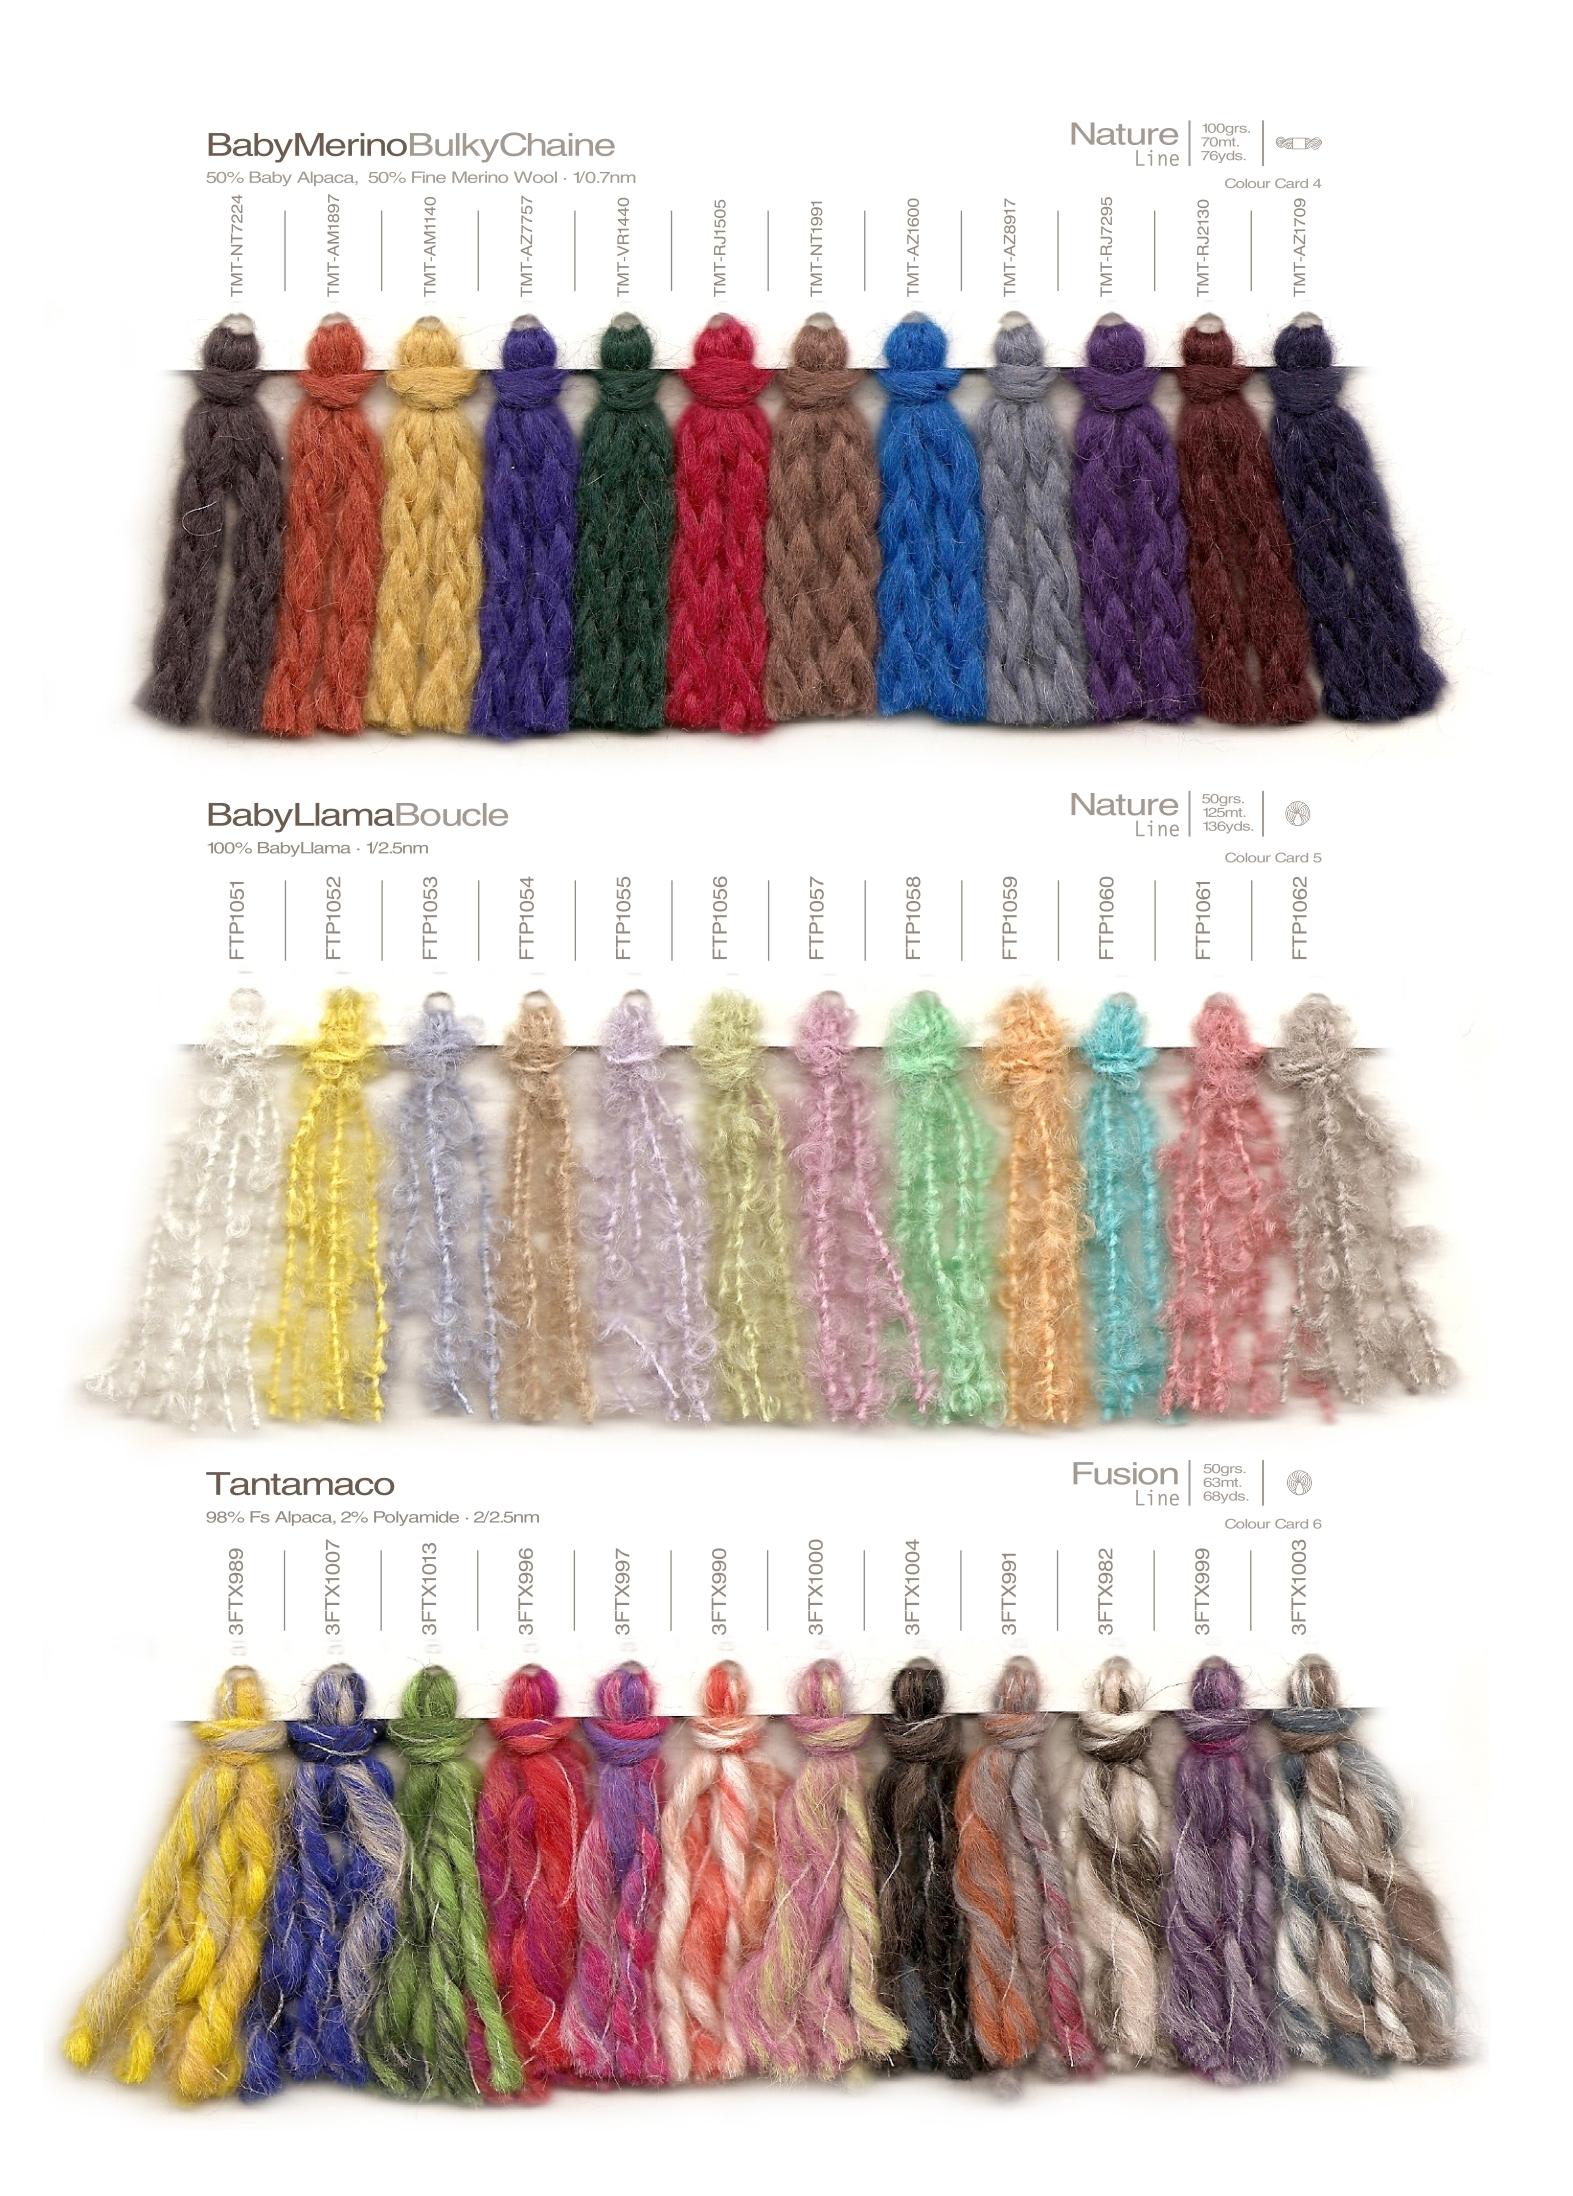 Hand Knitting Yarn : Alpaca hand knitting yarns colour trend aw